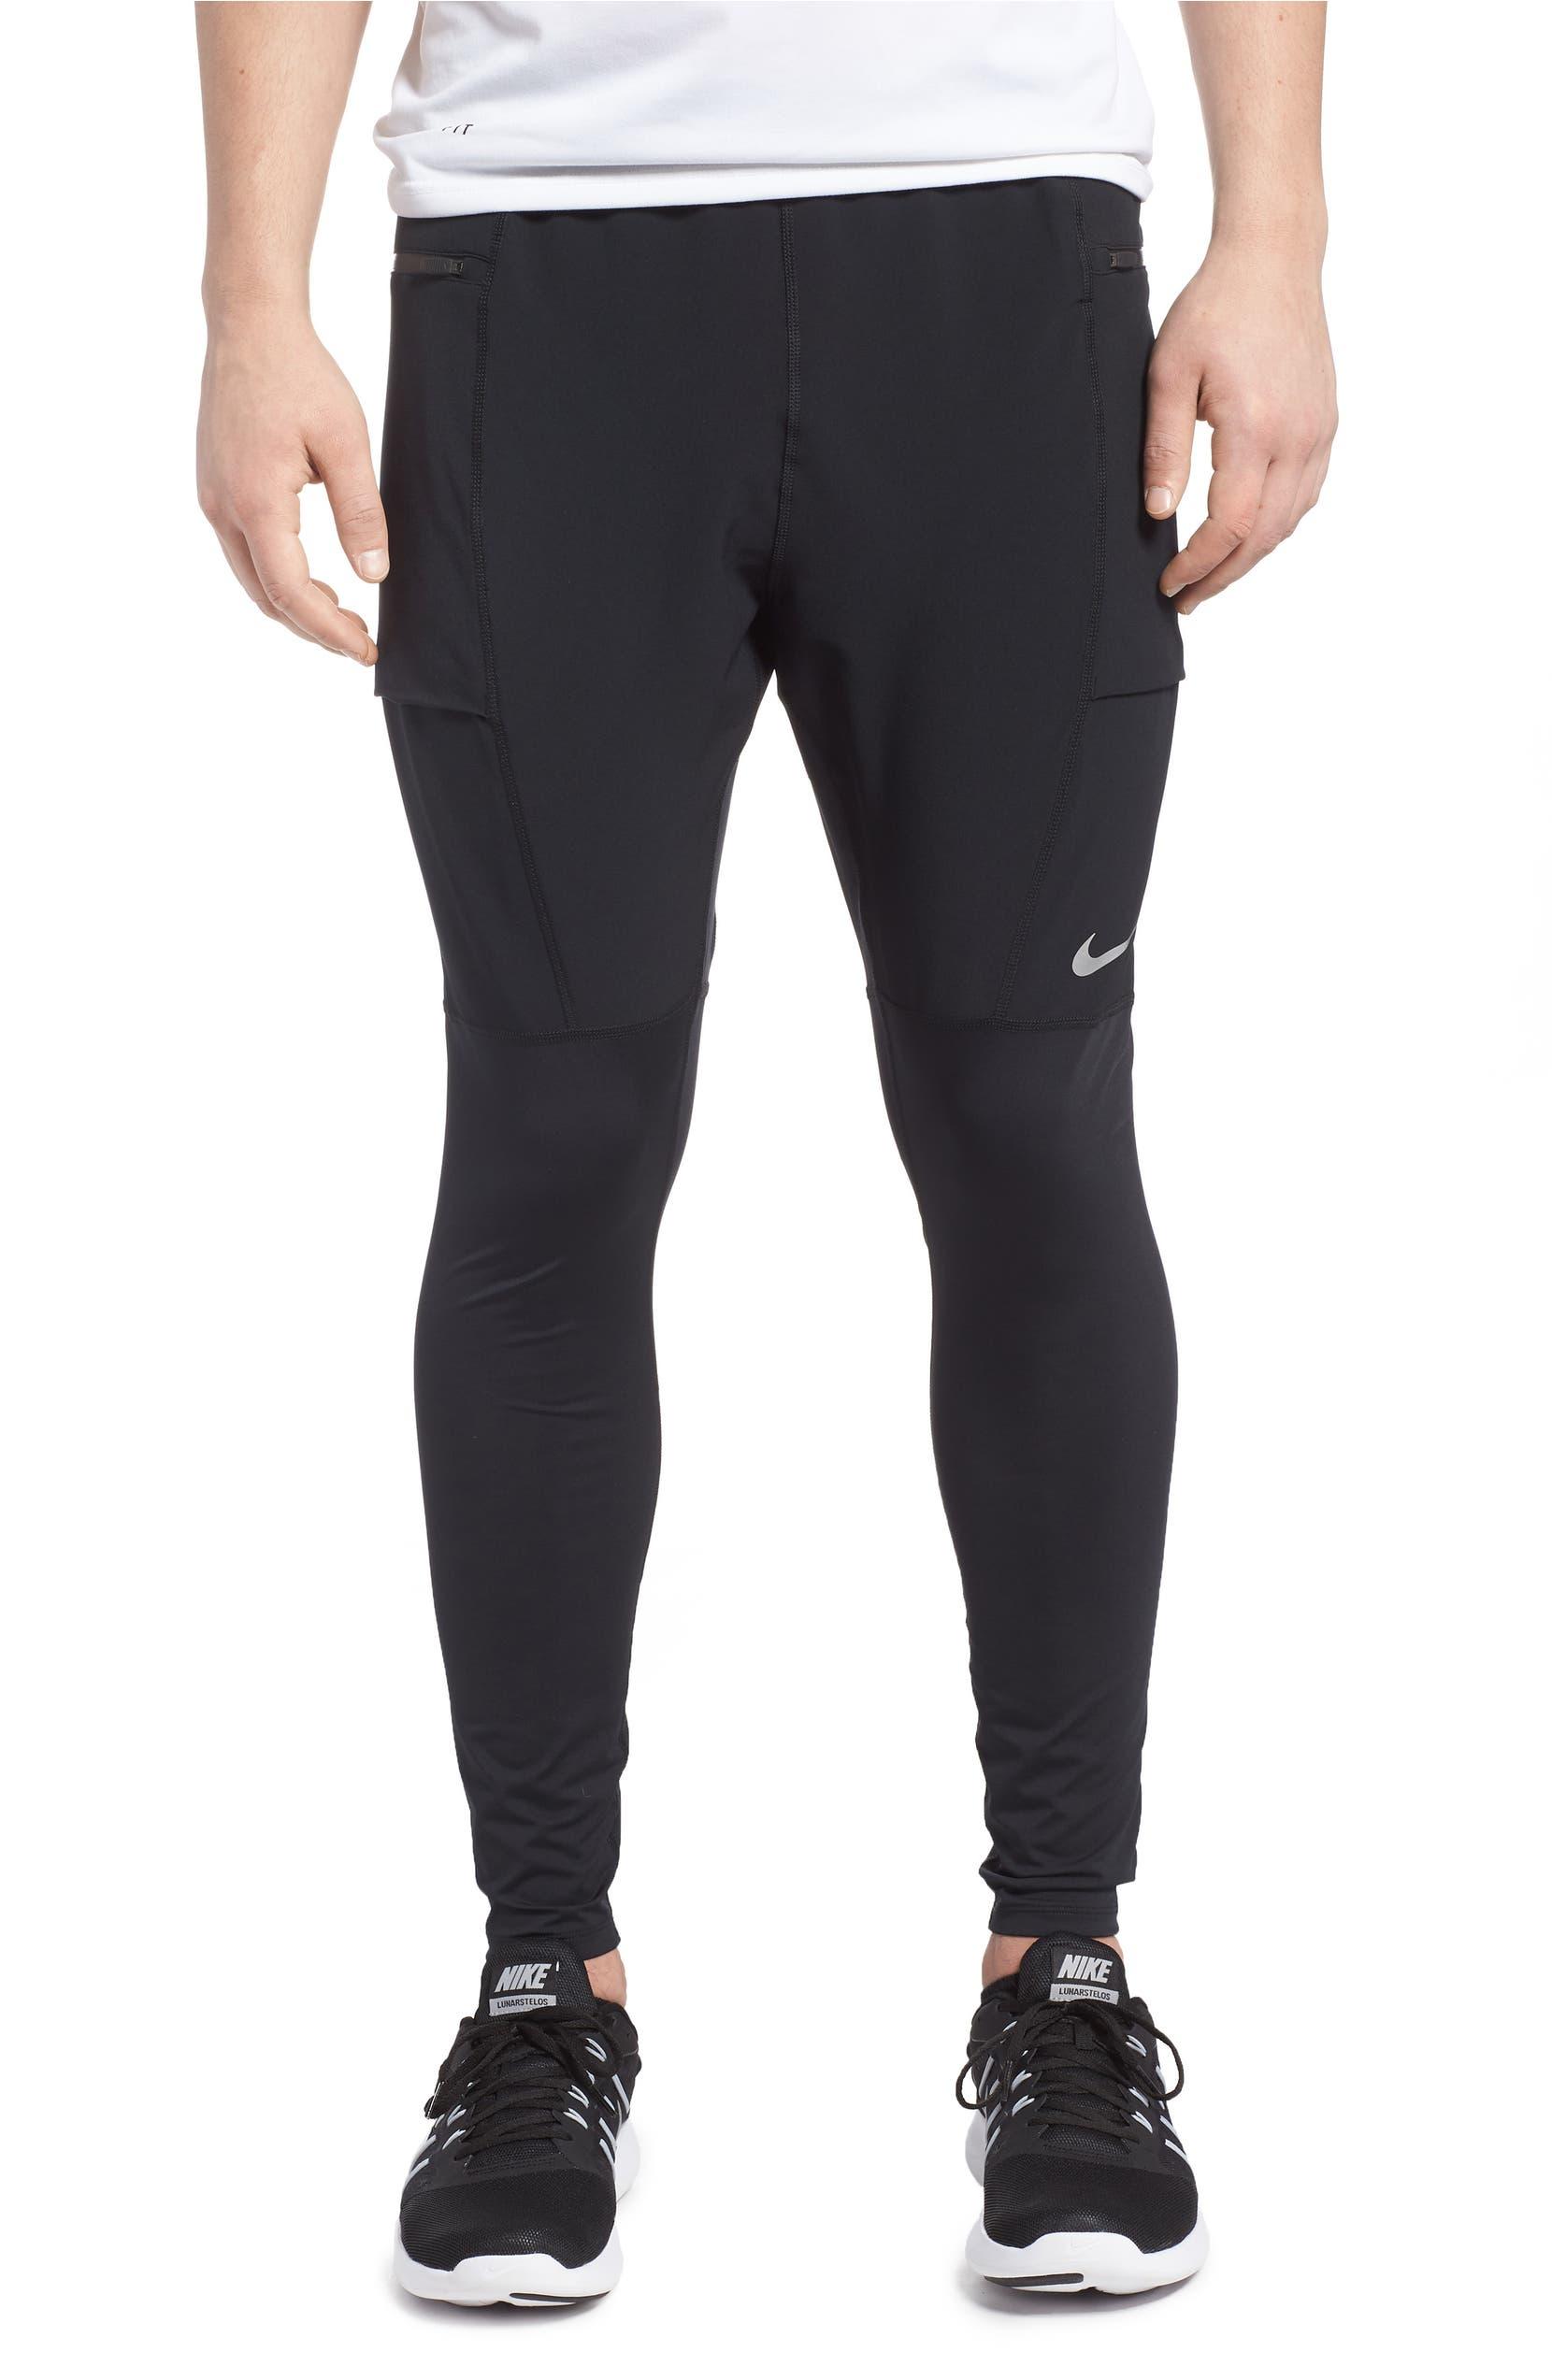 Nike Utility Running Pants  b248e9cfc